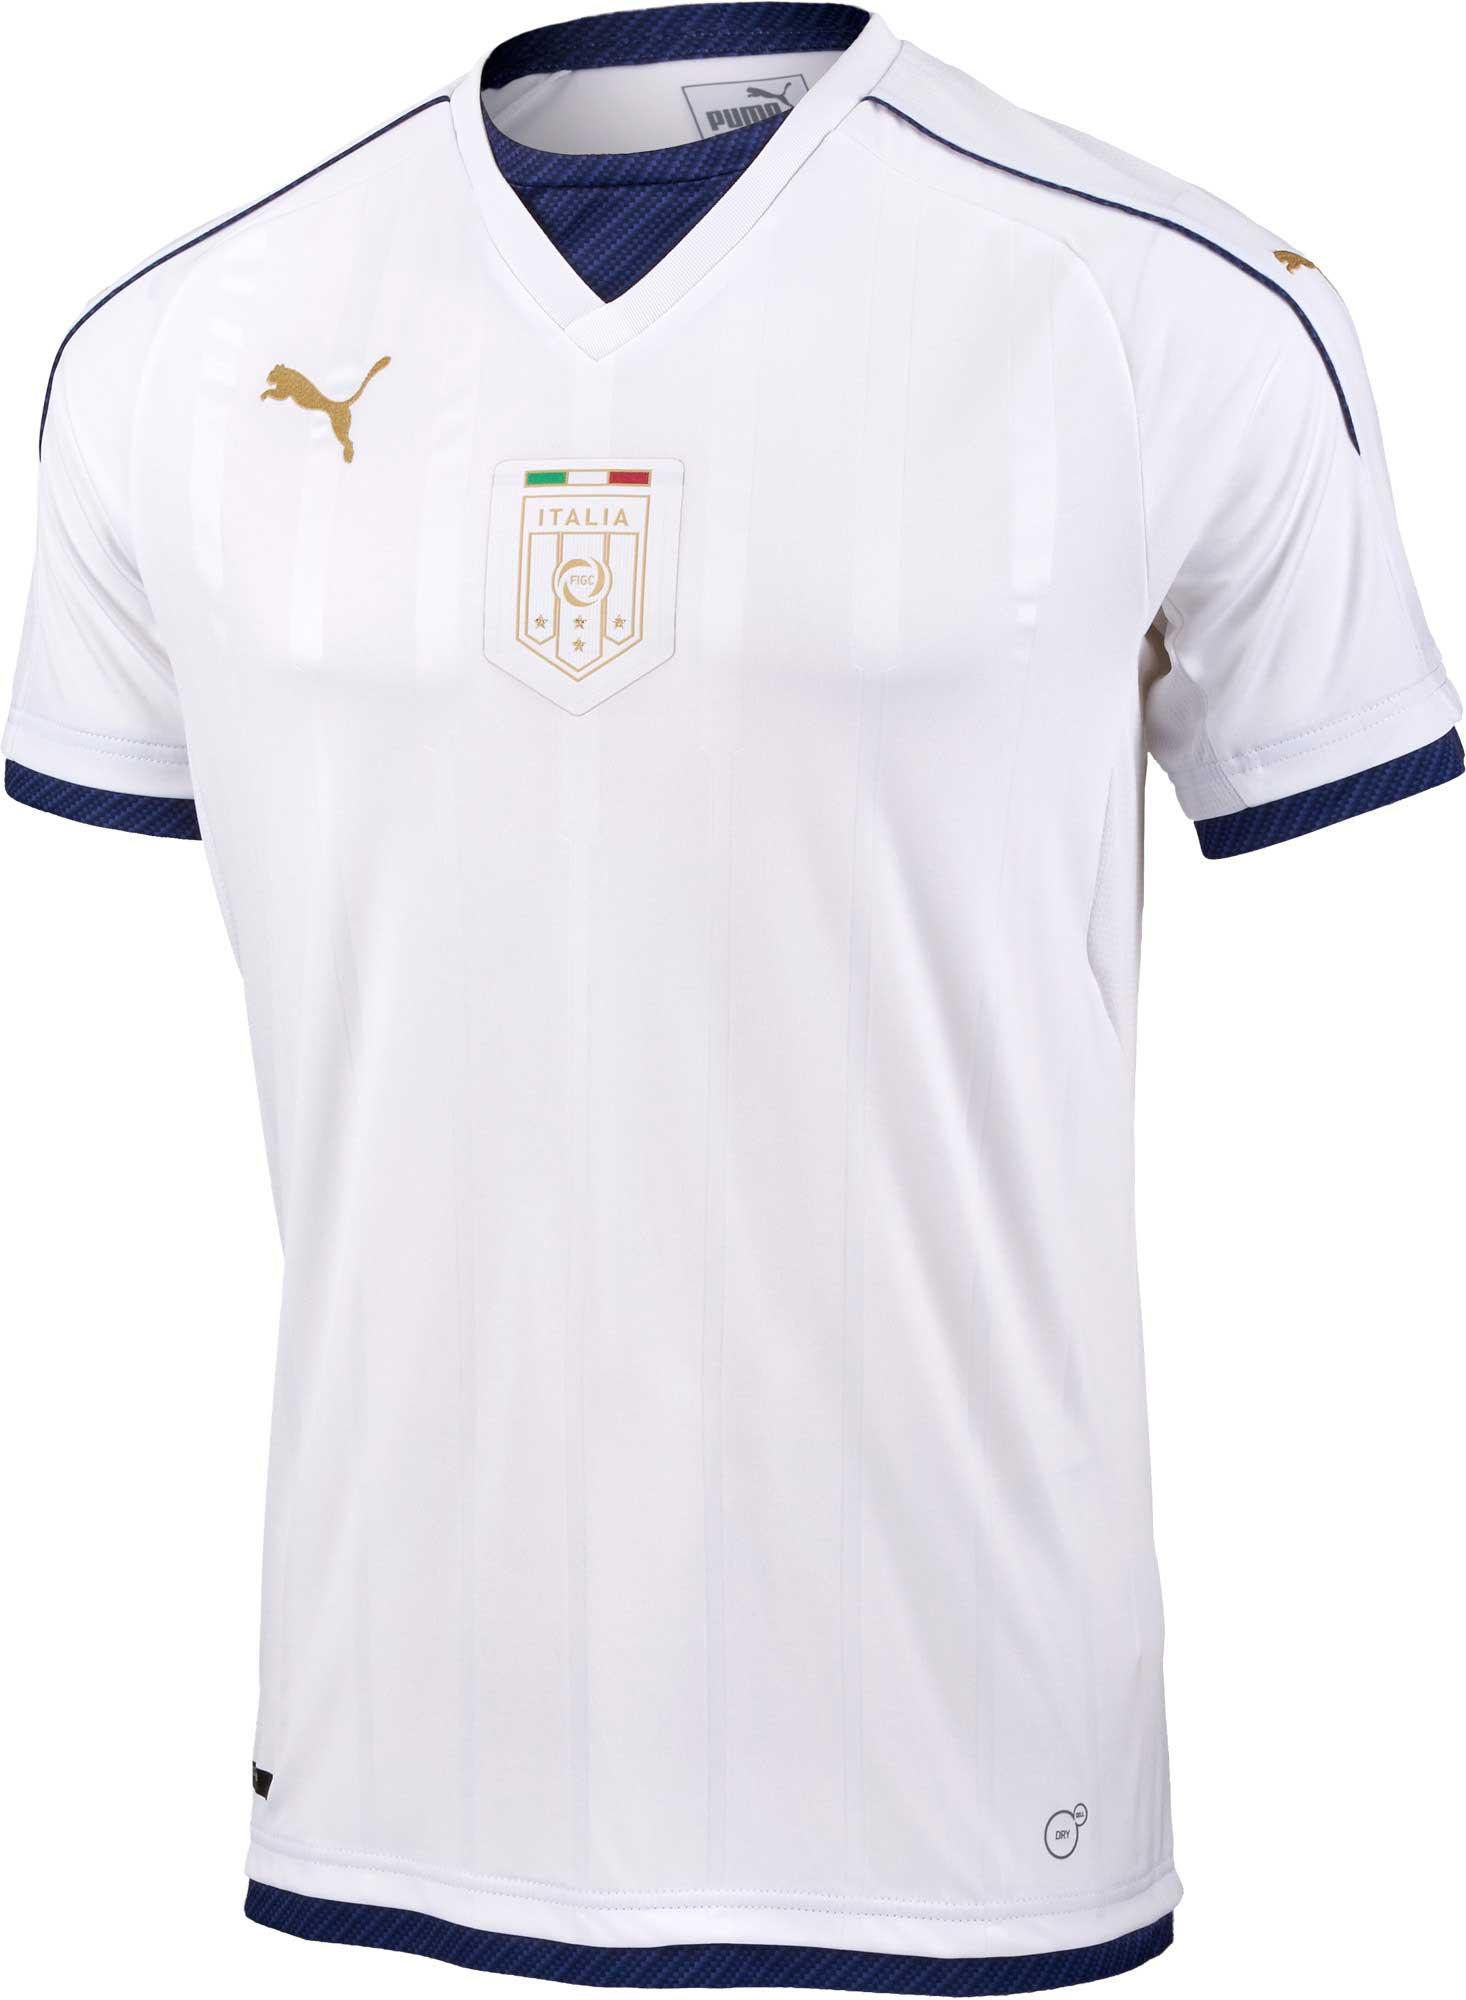 ec820b6a0 Puma Italy Tribute Away Jersey 2016 17 - Italy Jersey